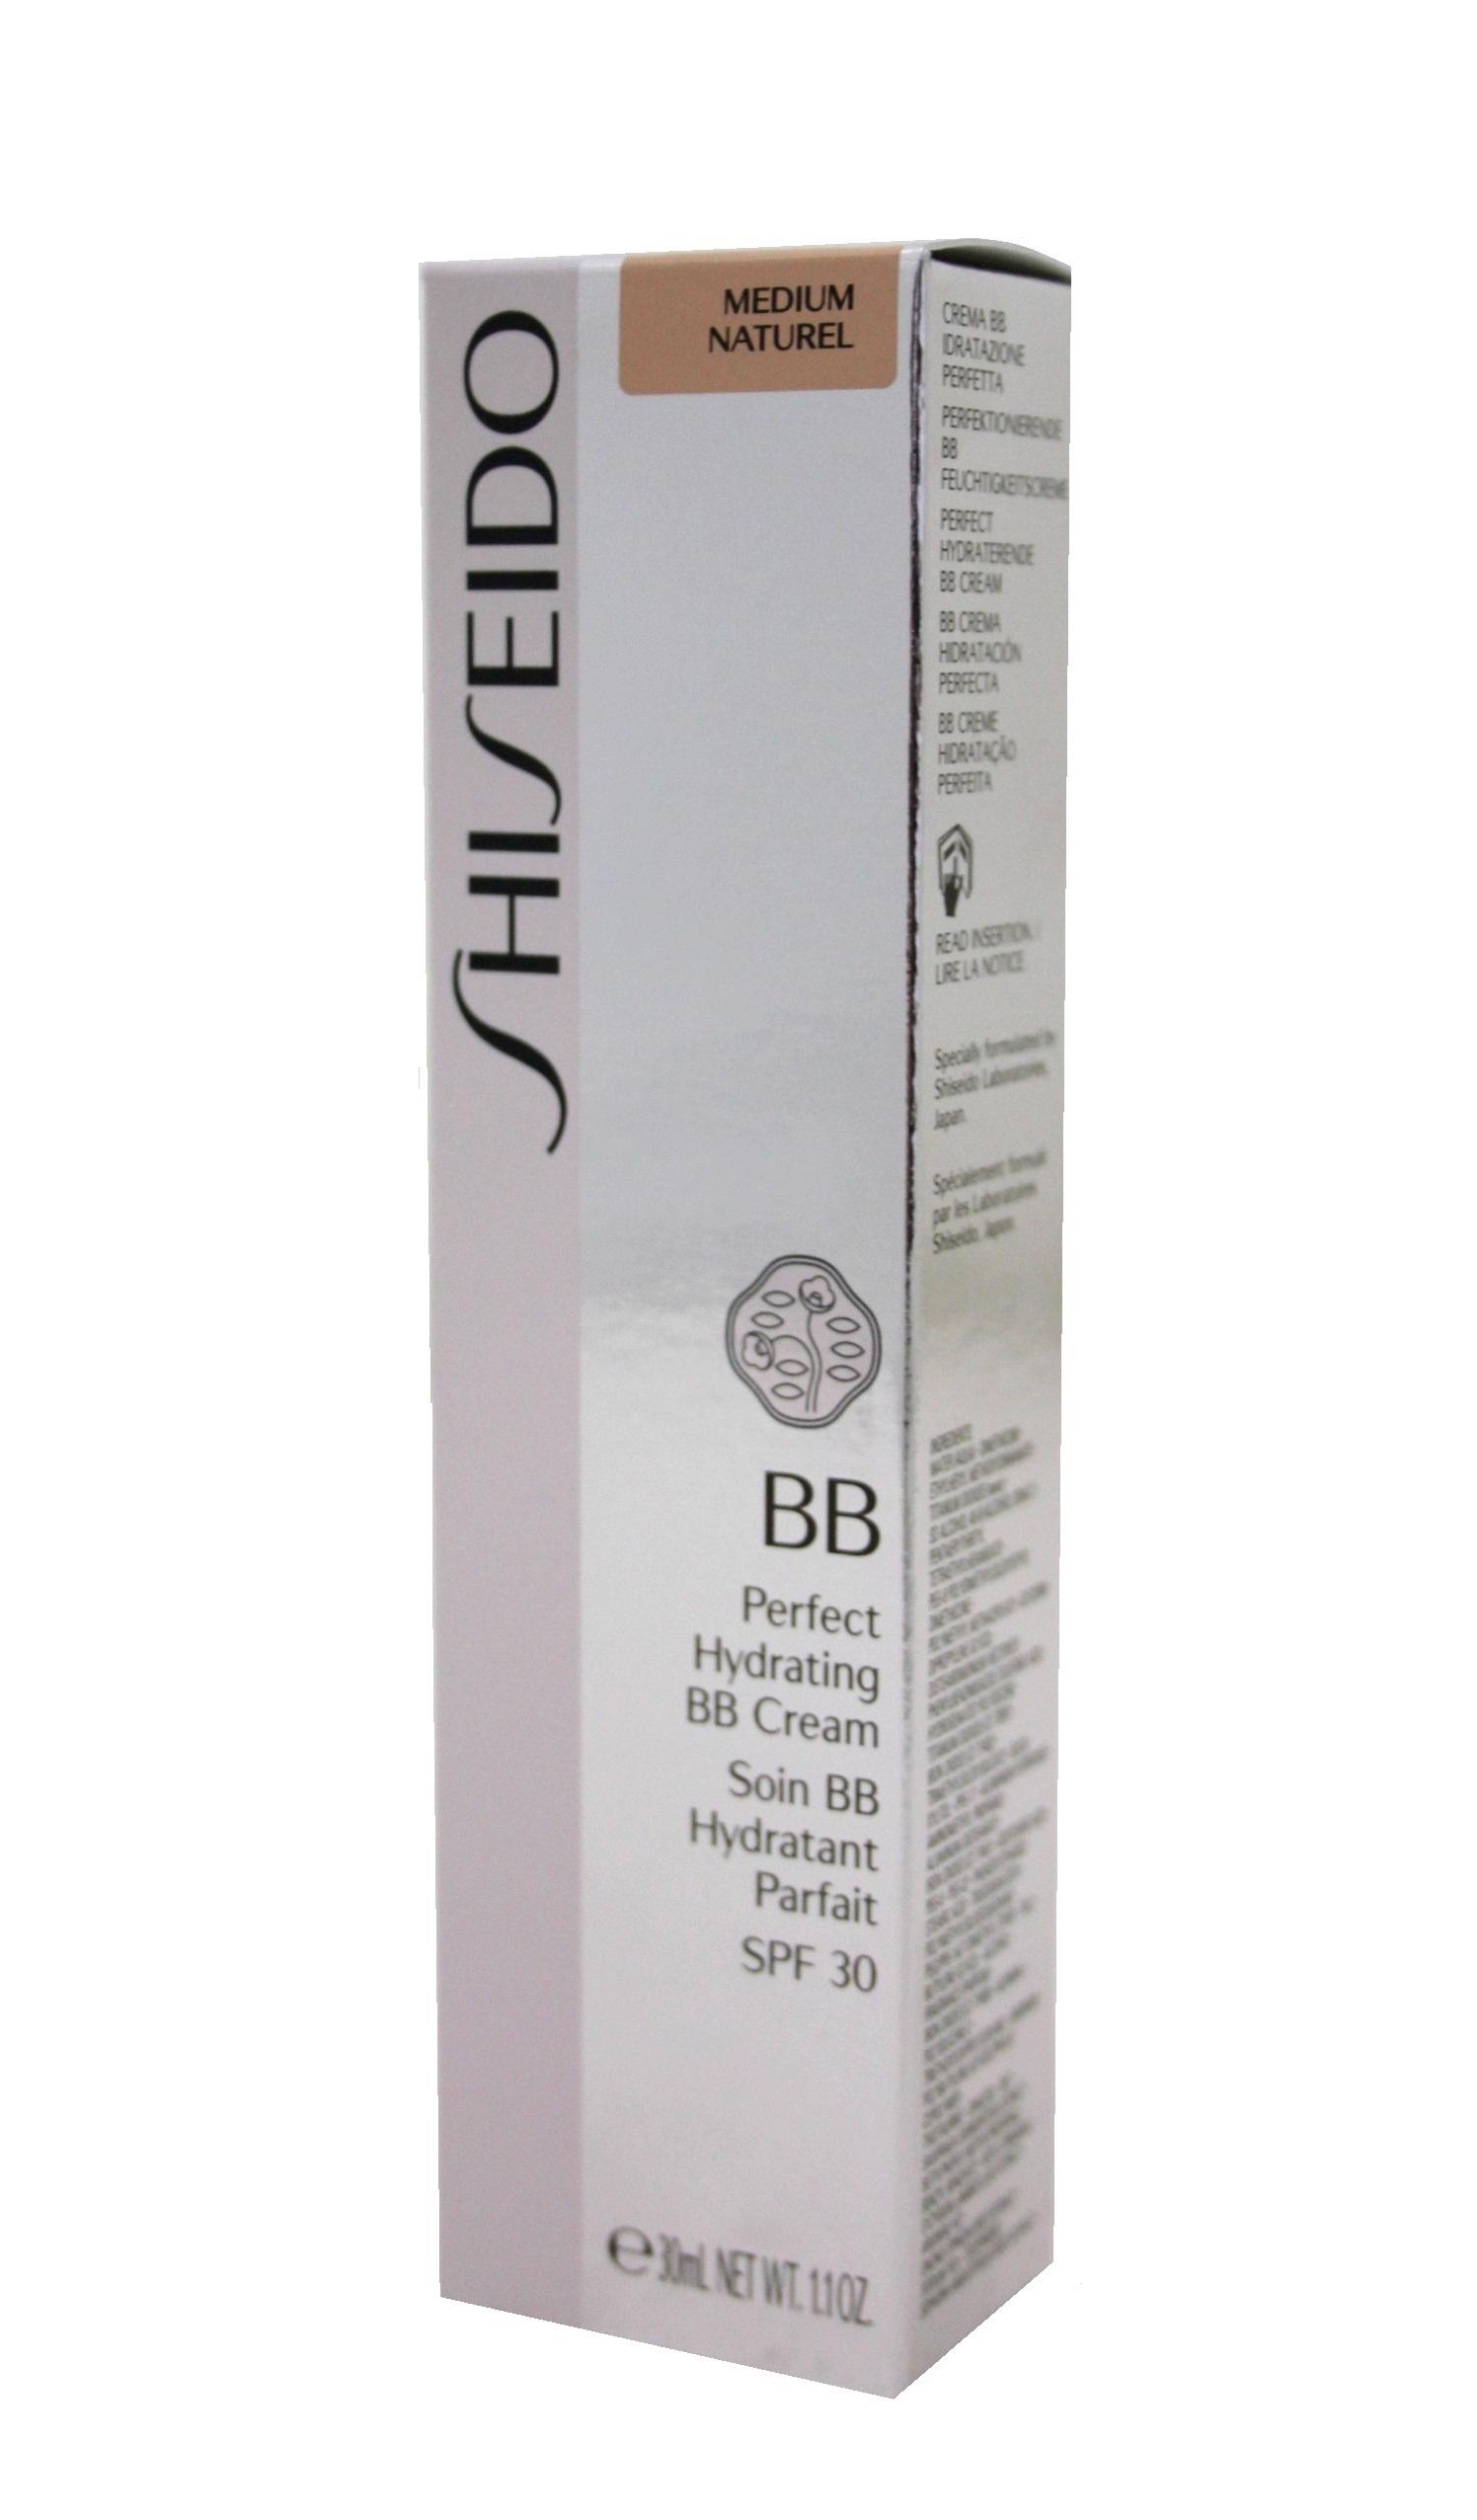 Shiseido Perfect Hydrating BB Cream SPF 30 Medium